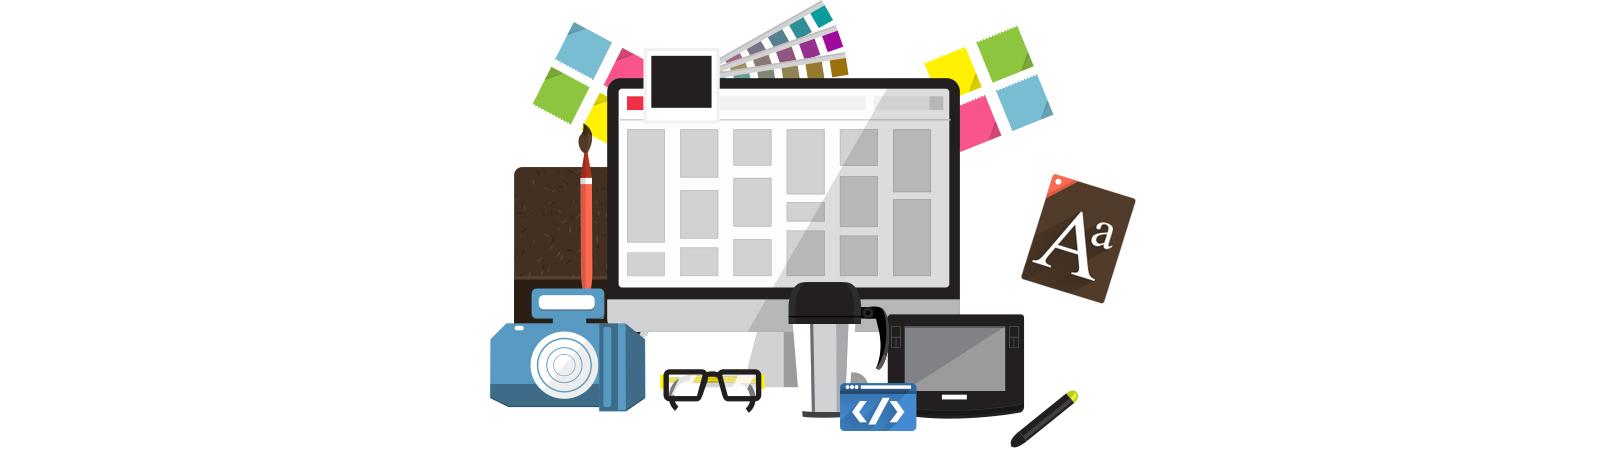 kel-leistungen-webdesign-printdesign-1